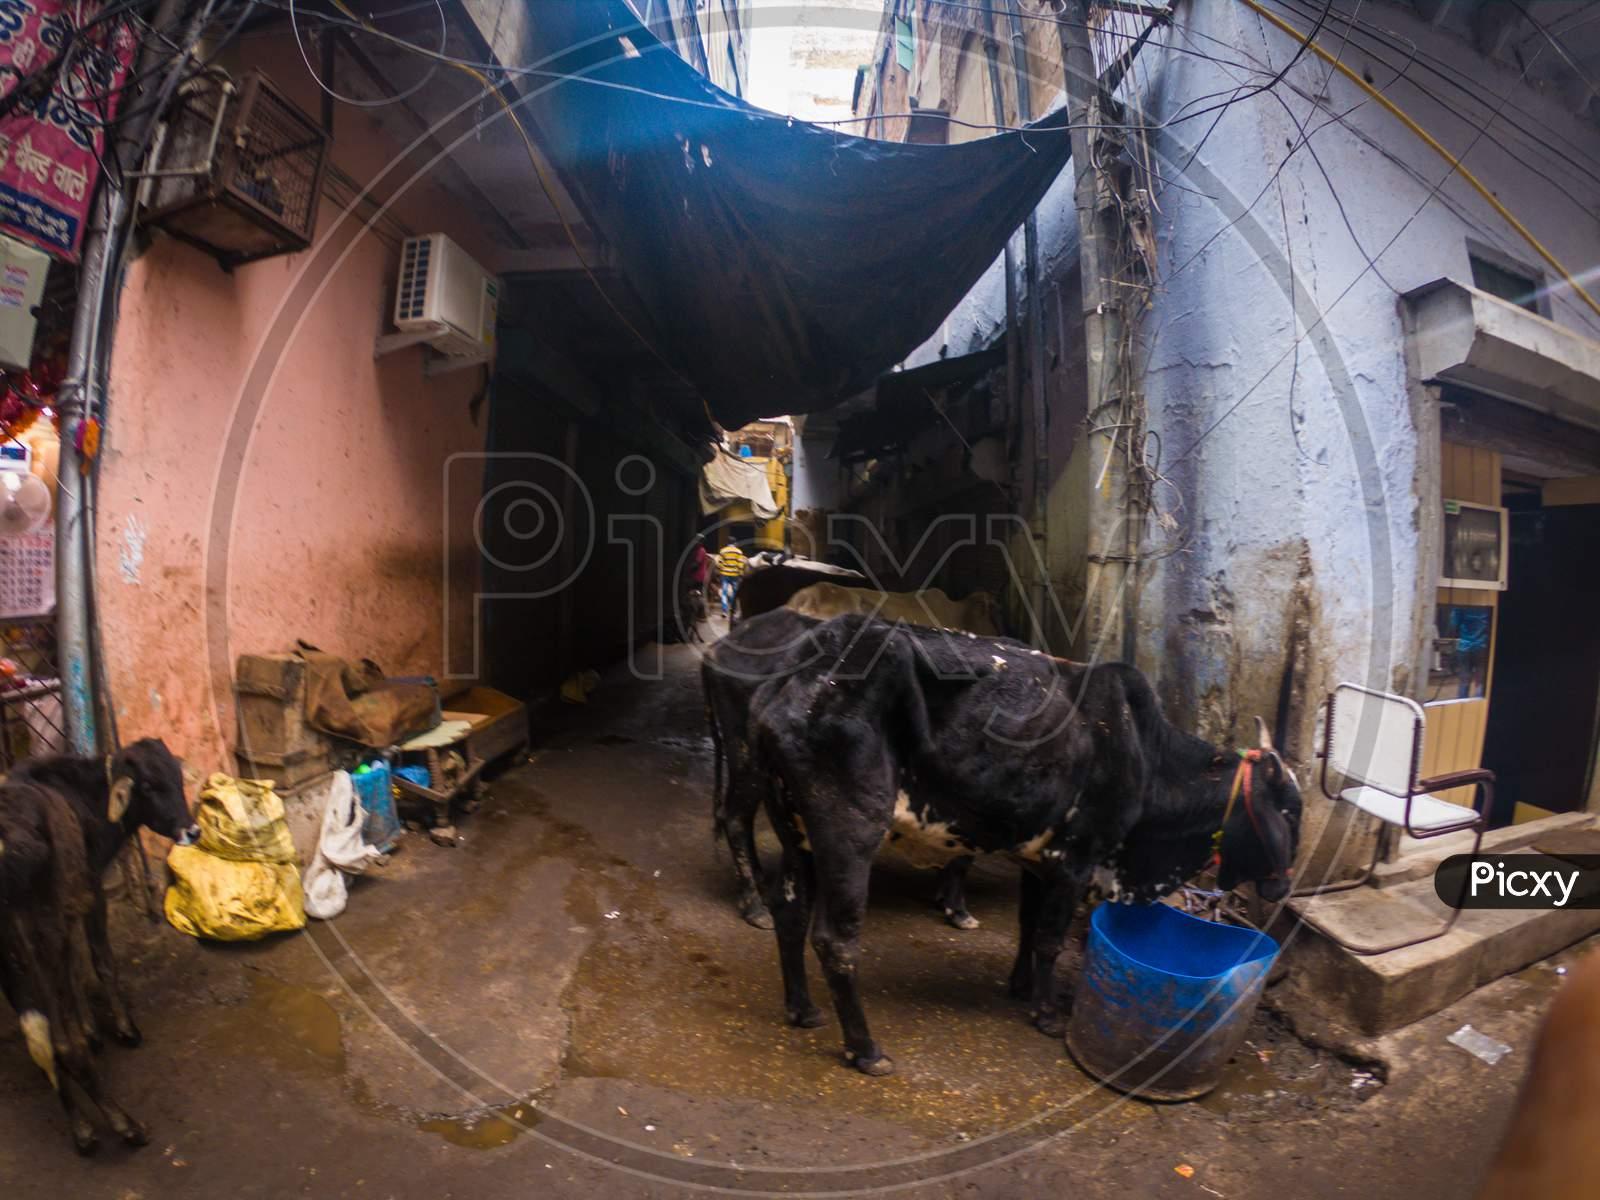 Purani Delhi Street And Market Or Shops Chandni Chowk